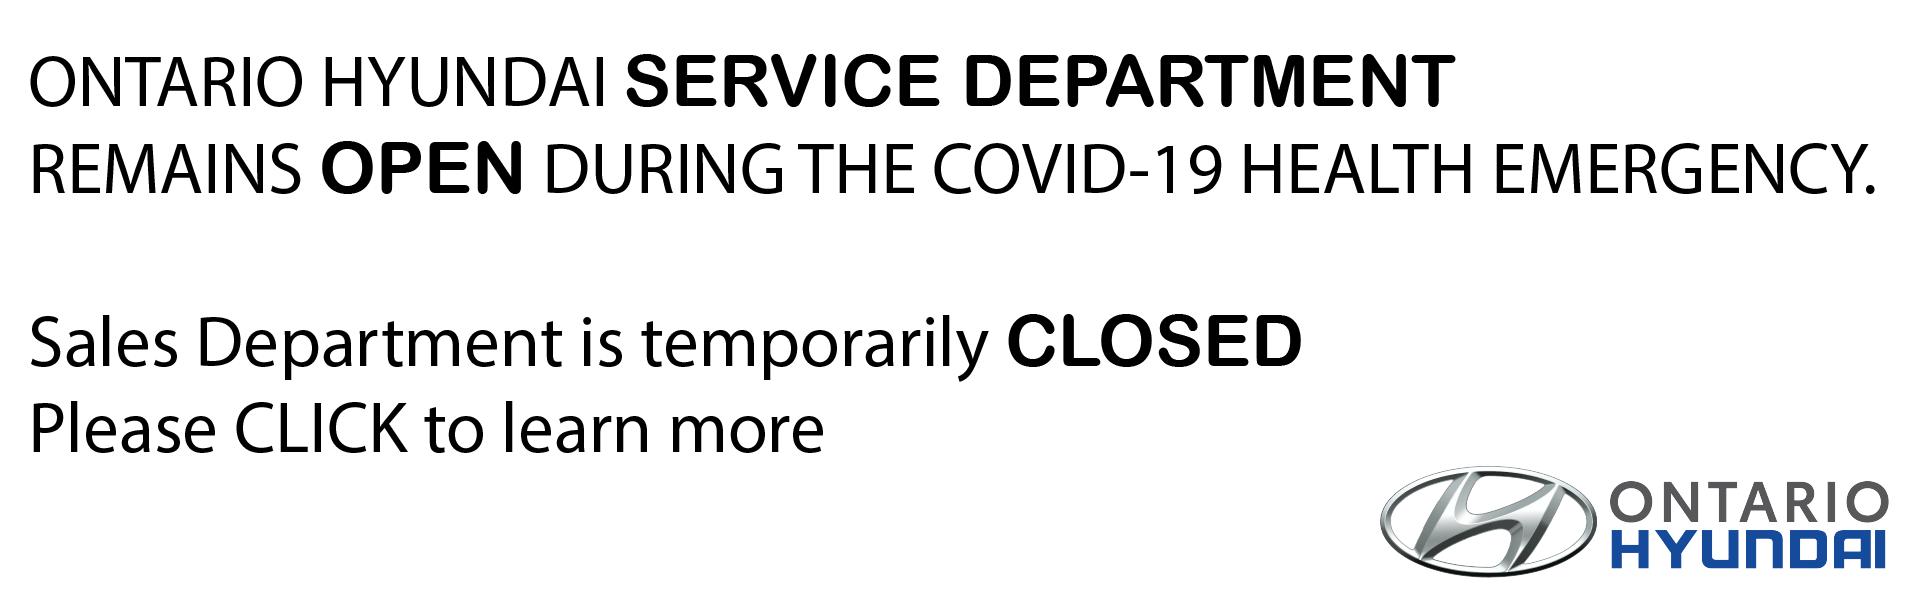 COVID 19 Service Open Sales Closed at Ontario Hyundai